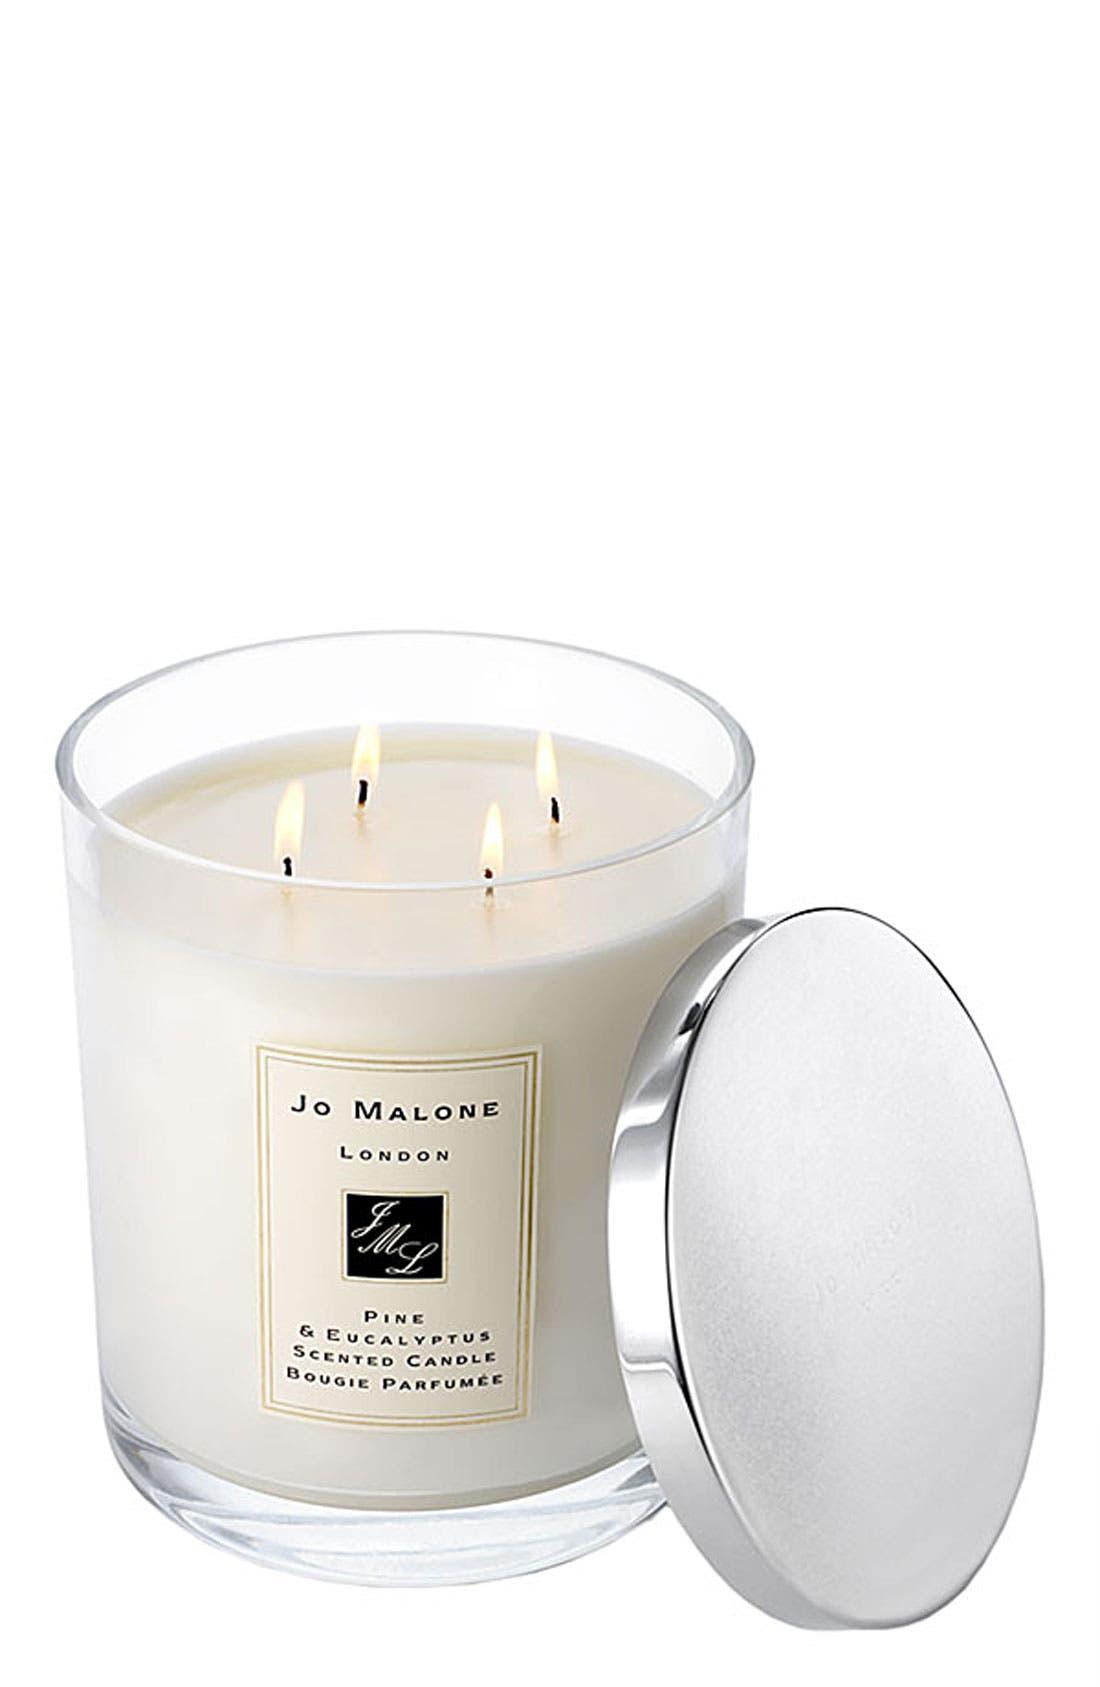 Jo Malone™ 'Pine & Eucalyptus' Luxury Candle